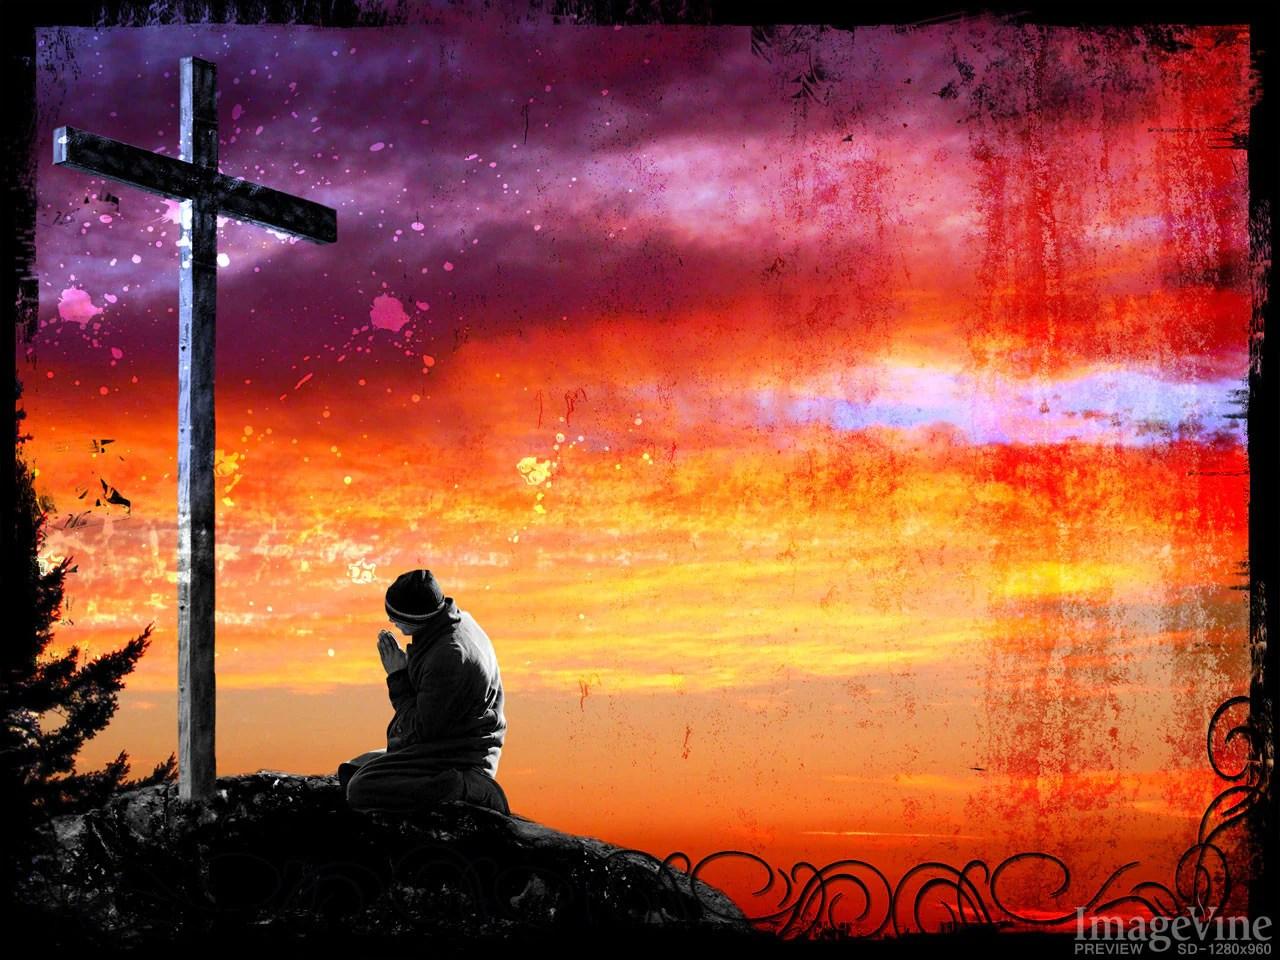 Fall Christian Wallpaper Easter Backgrounds Bundle Imagevine